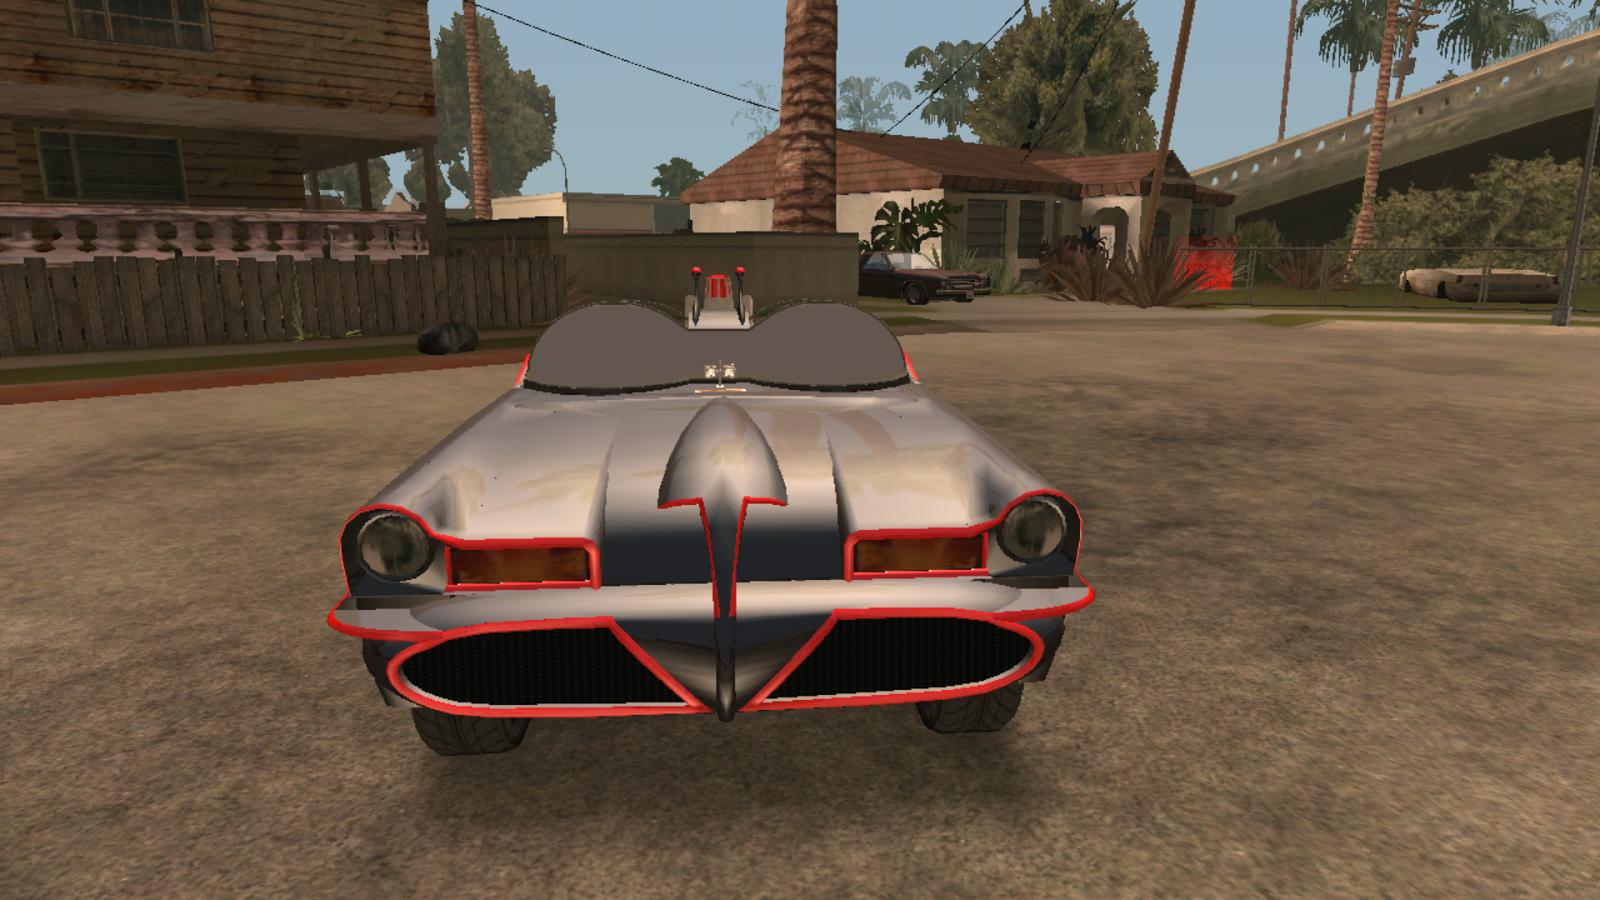 MOD GTA ANDROID: Cars